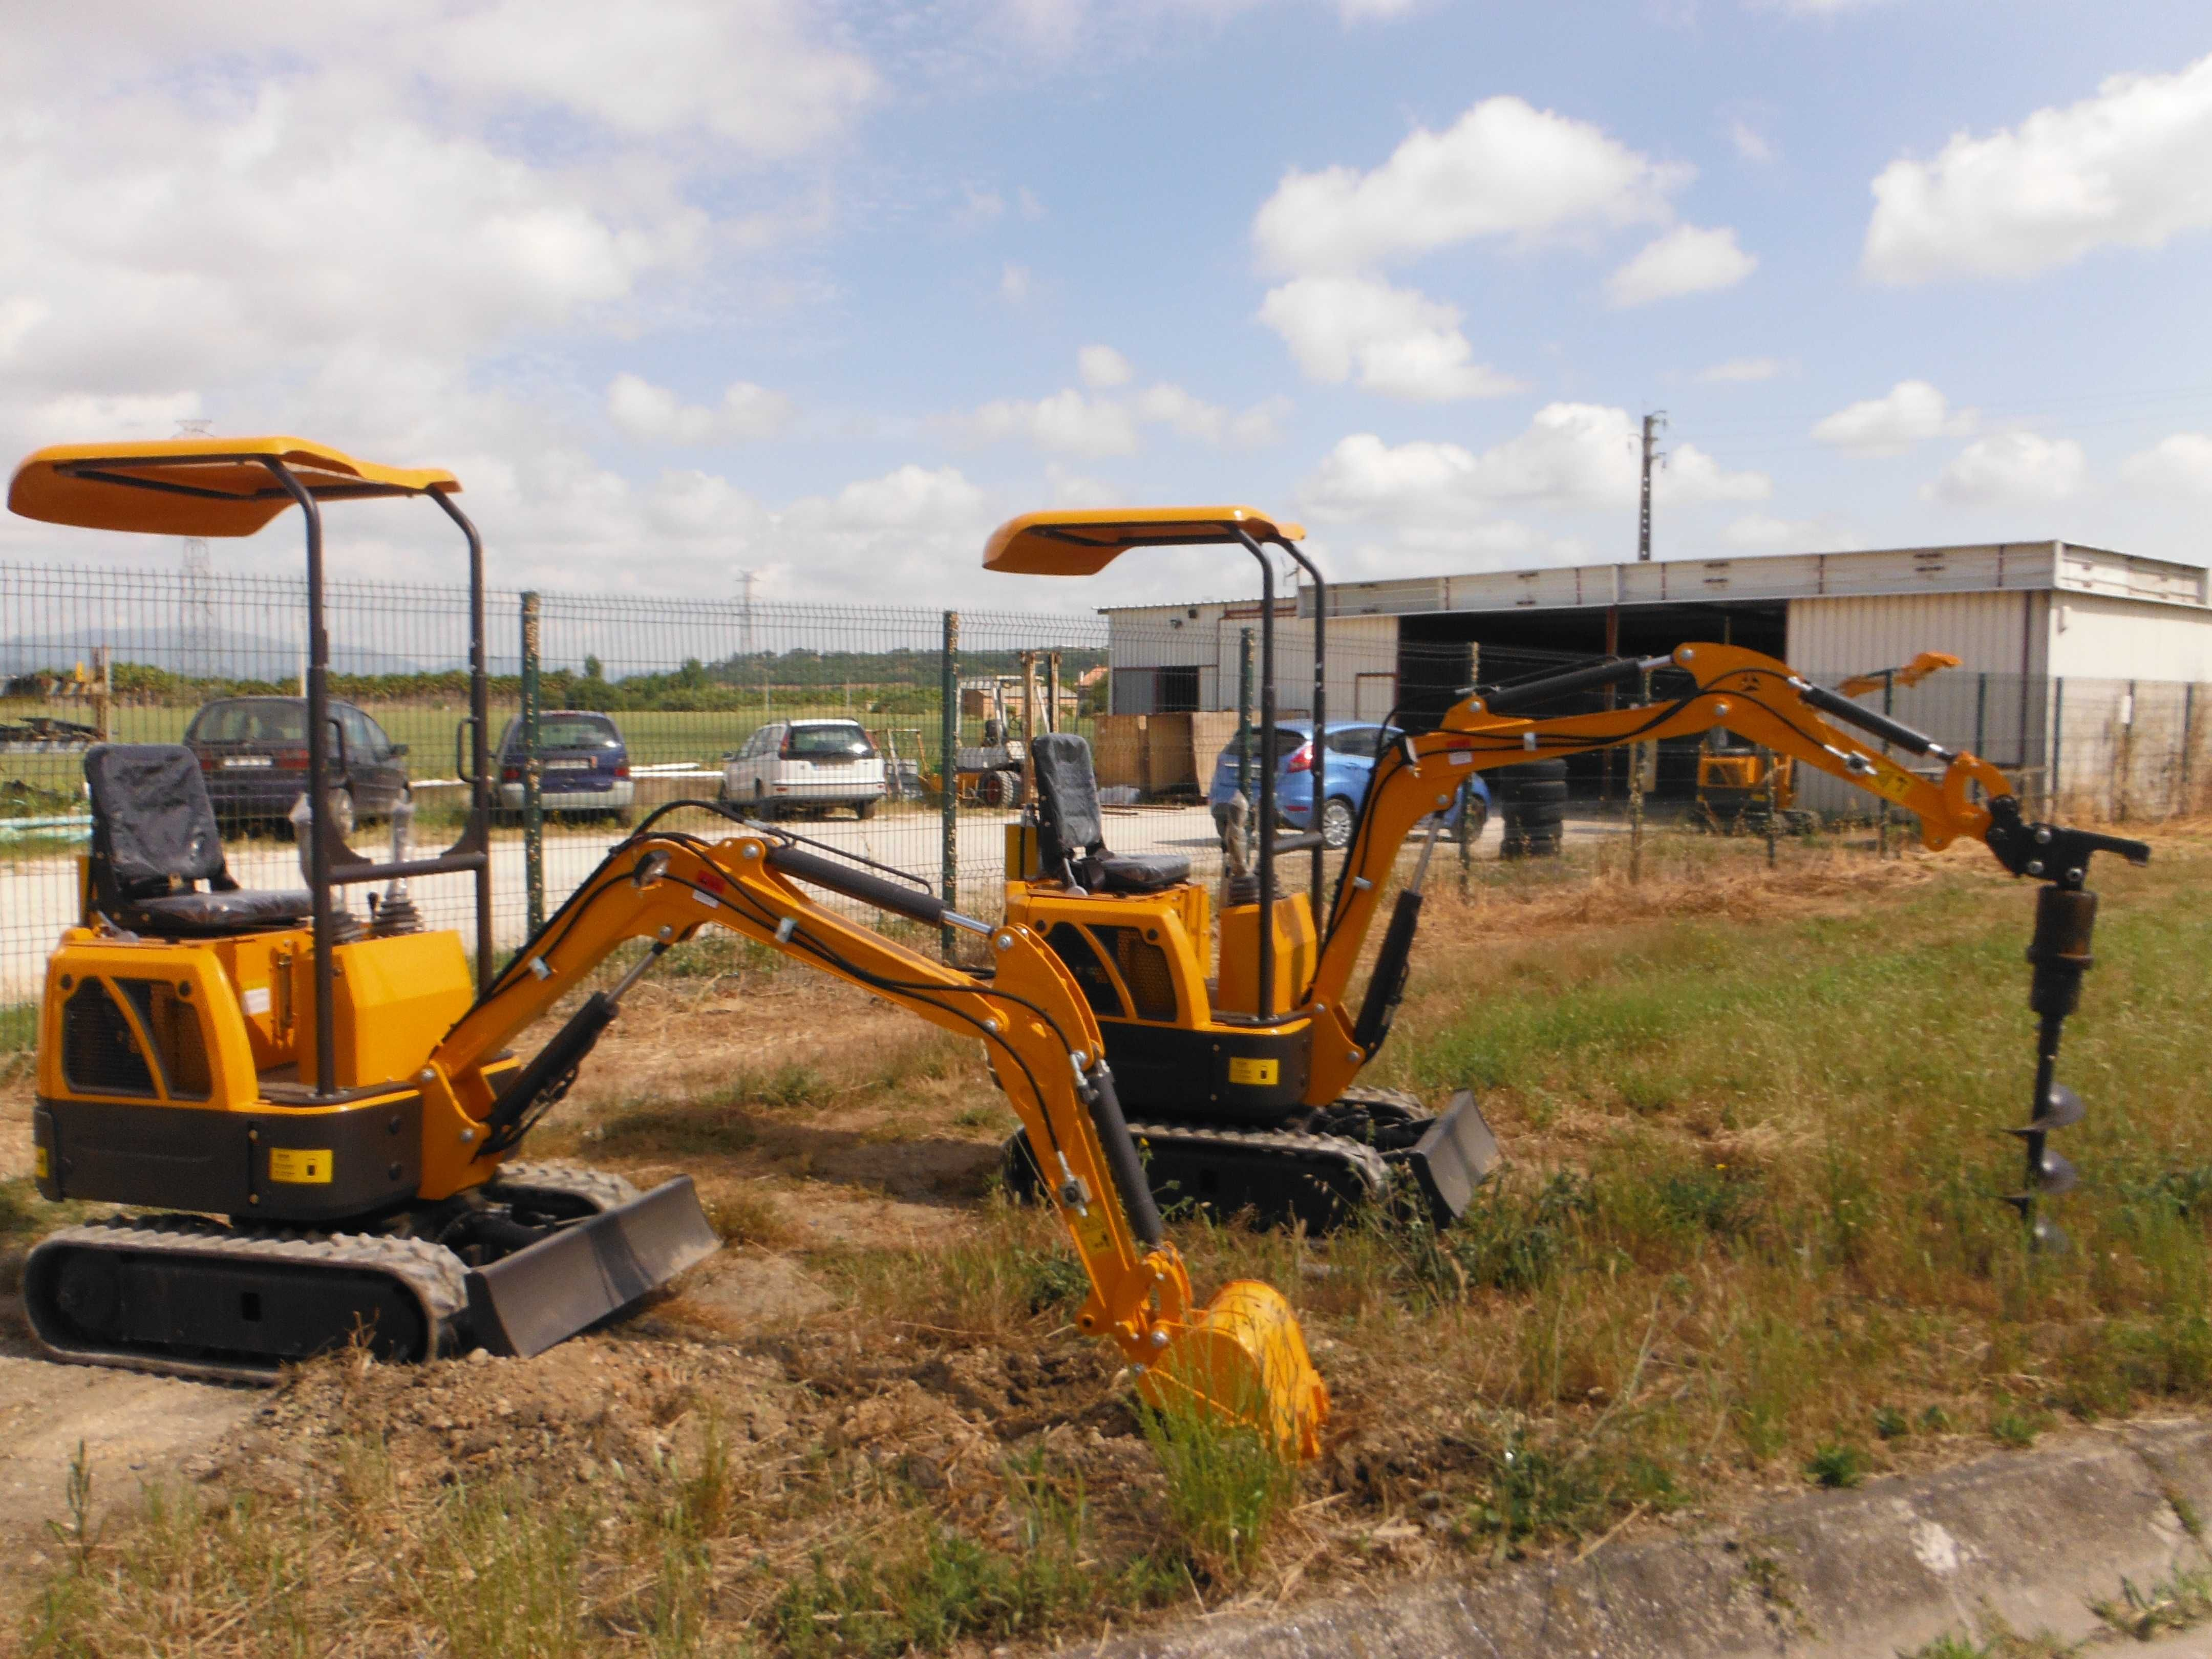 Mini escavadoras giratorias diesel 1.ton novas, cert C.E